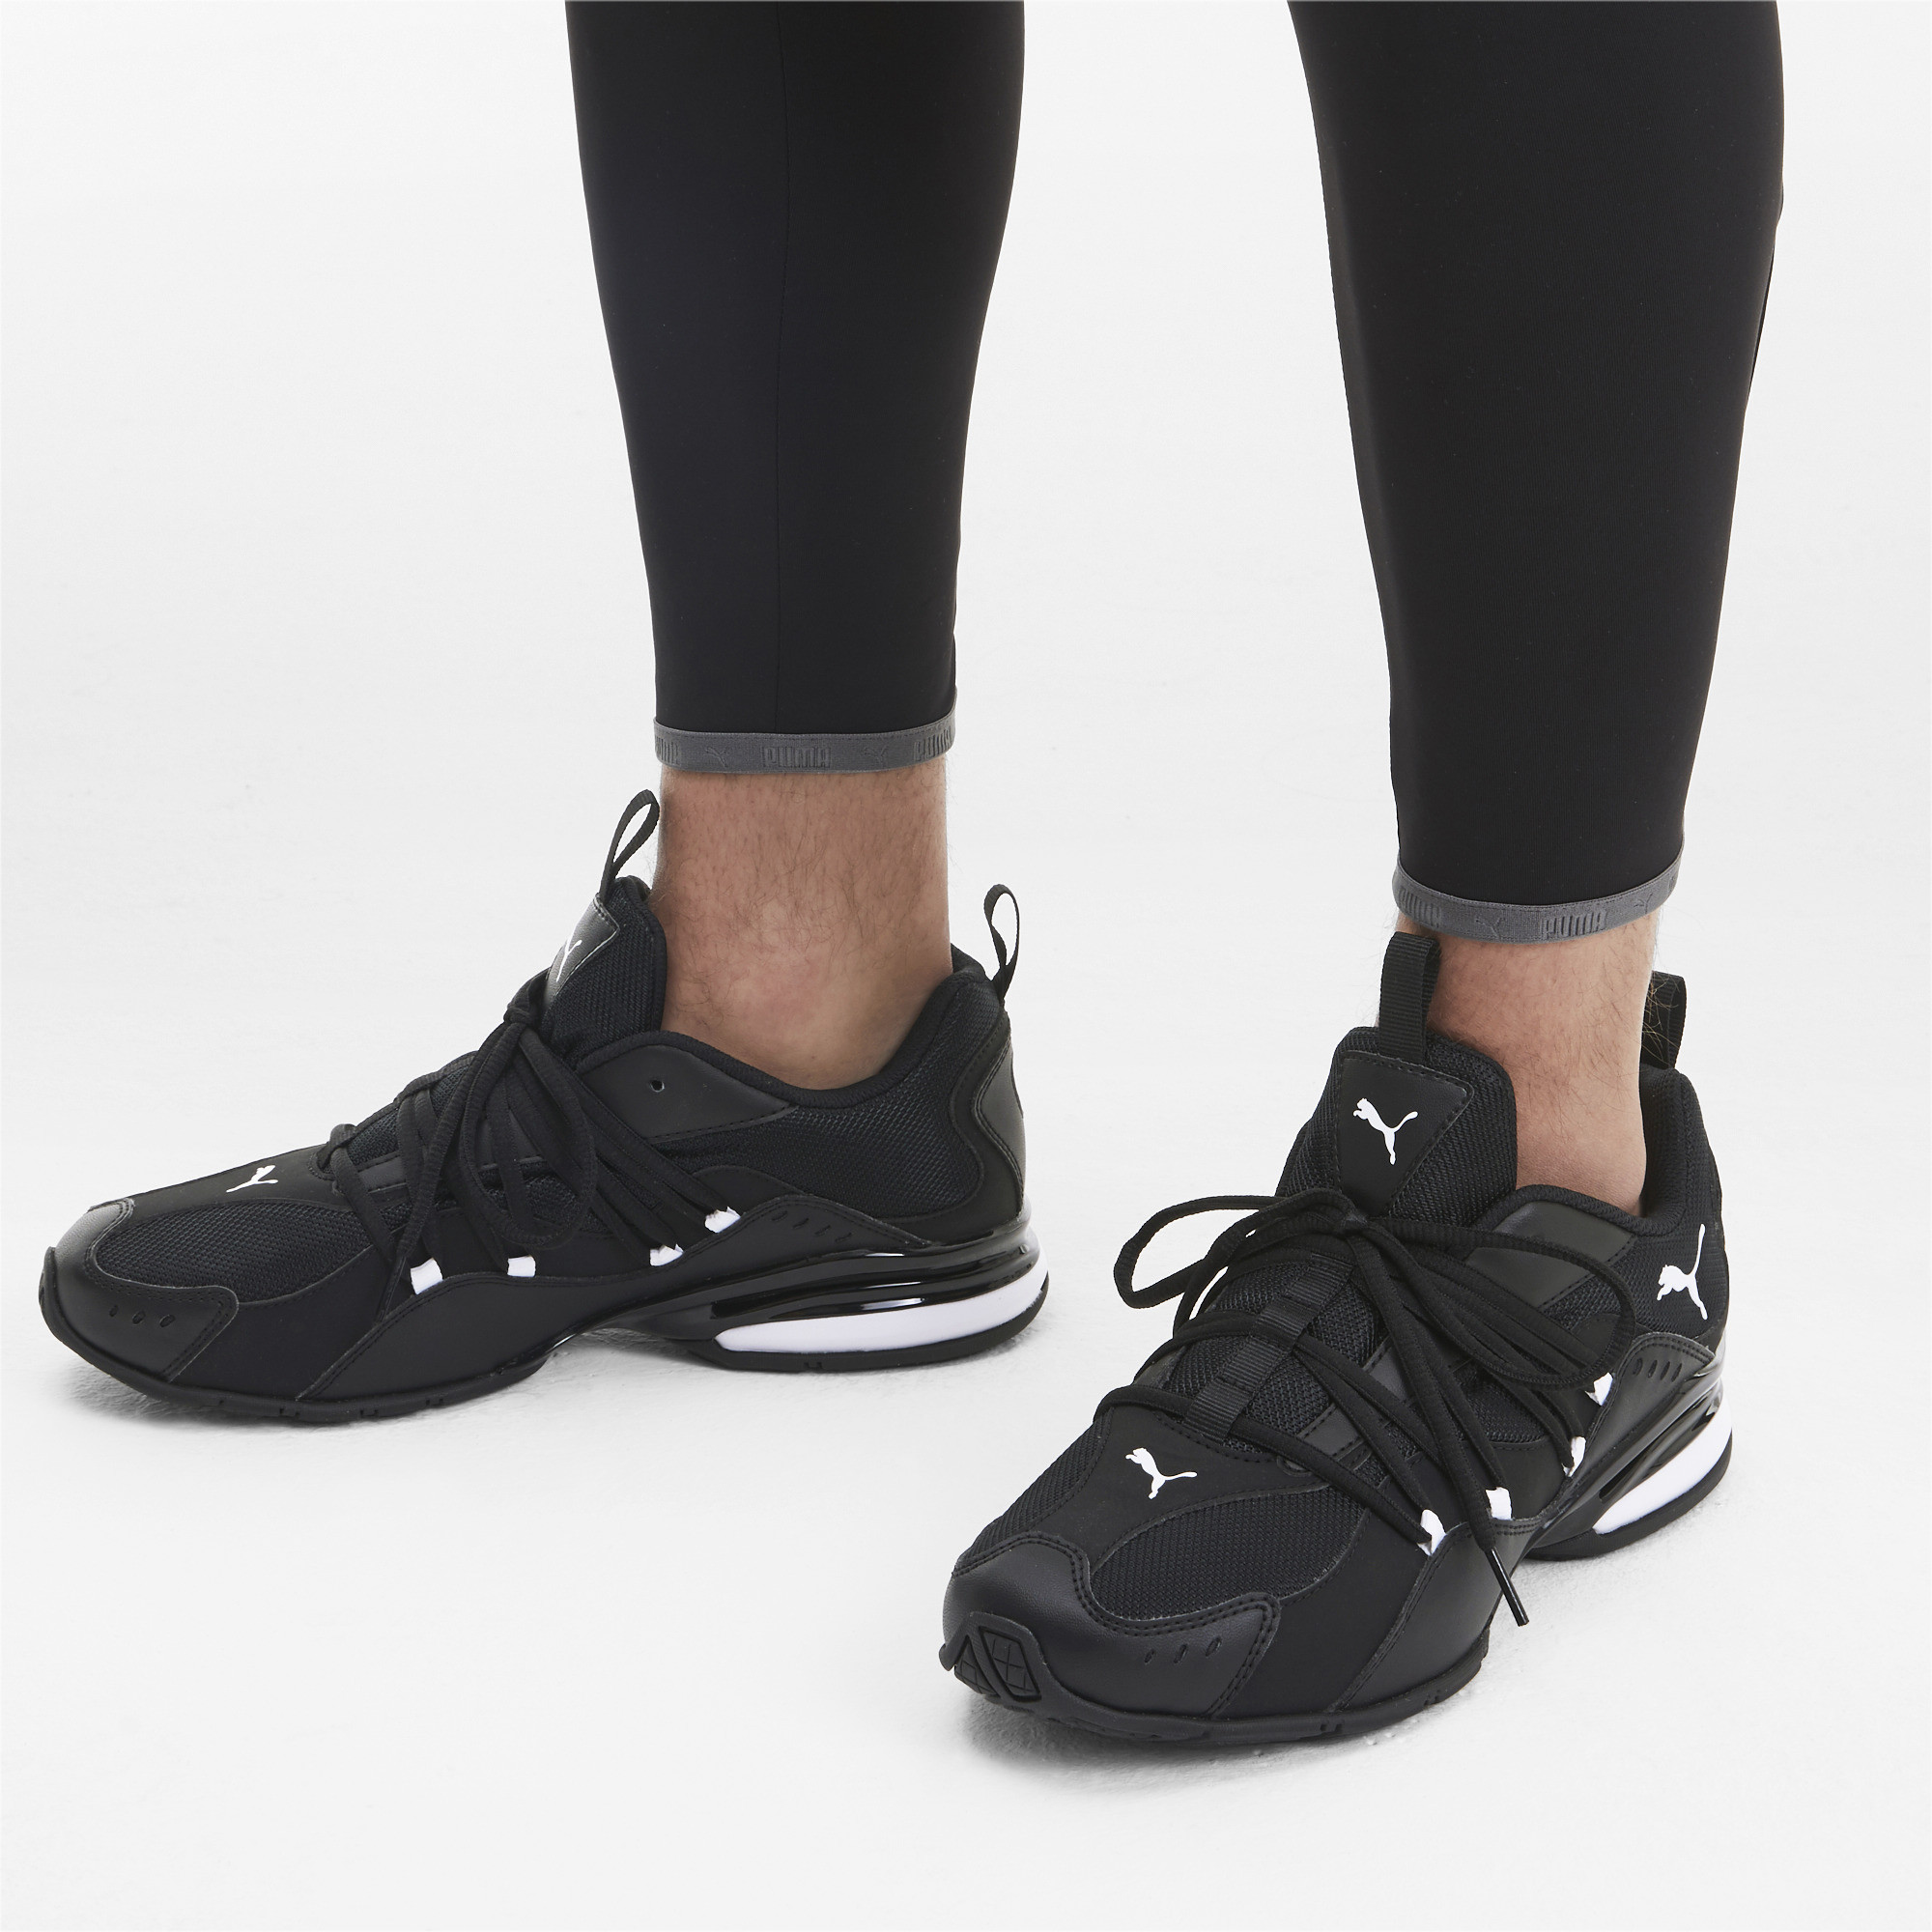 PUMA-Silverion-Men-s-Running-Shoes-Men-Shoe-Running thumbnail 10